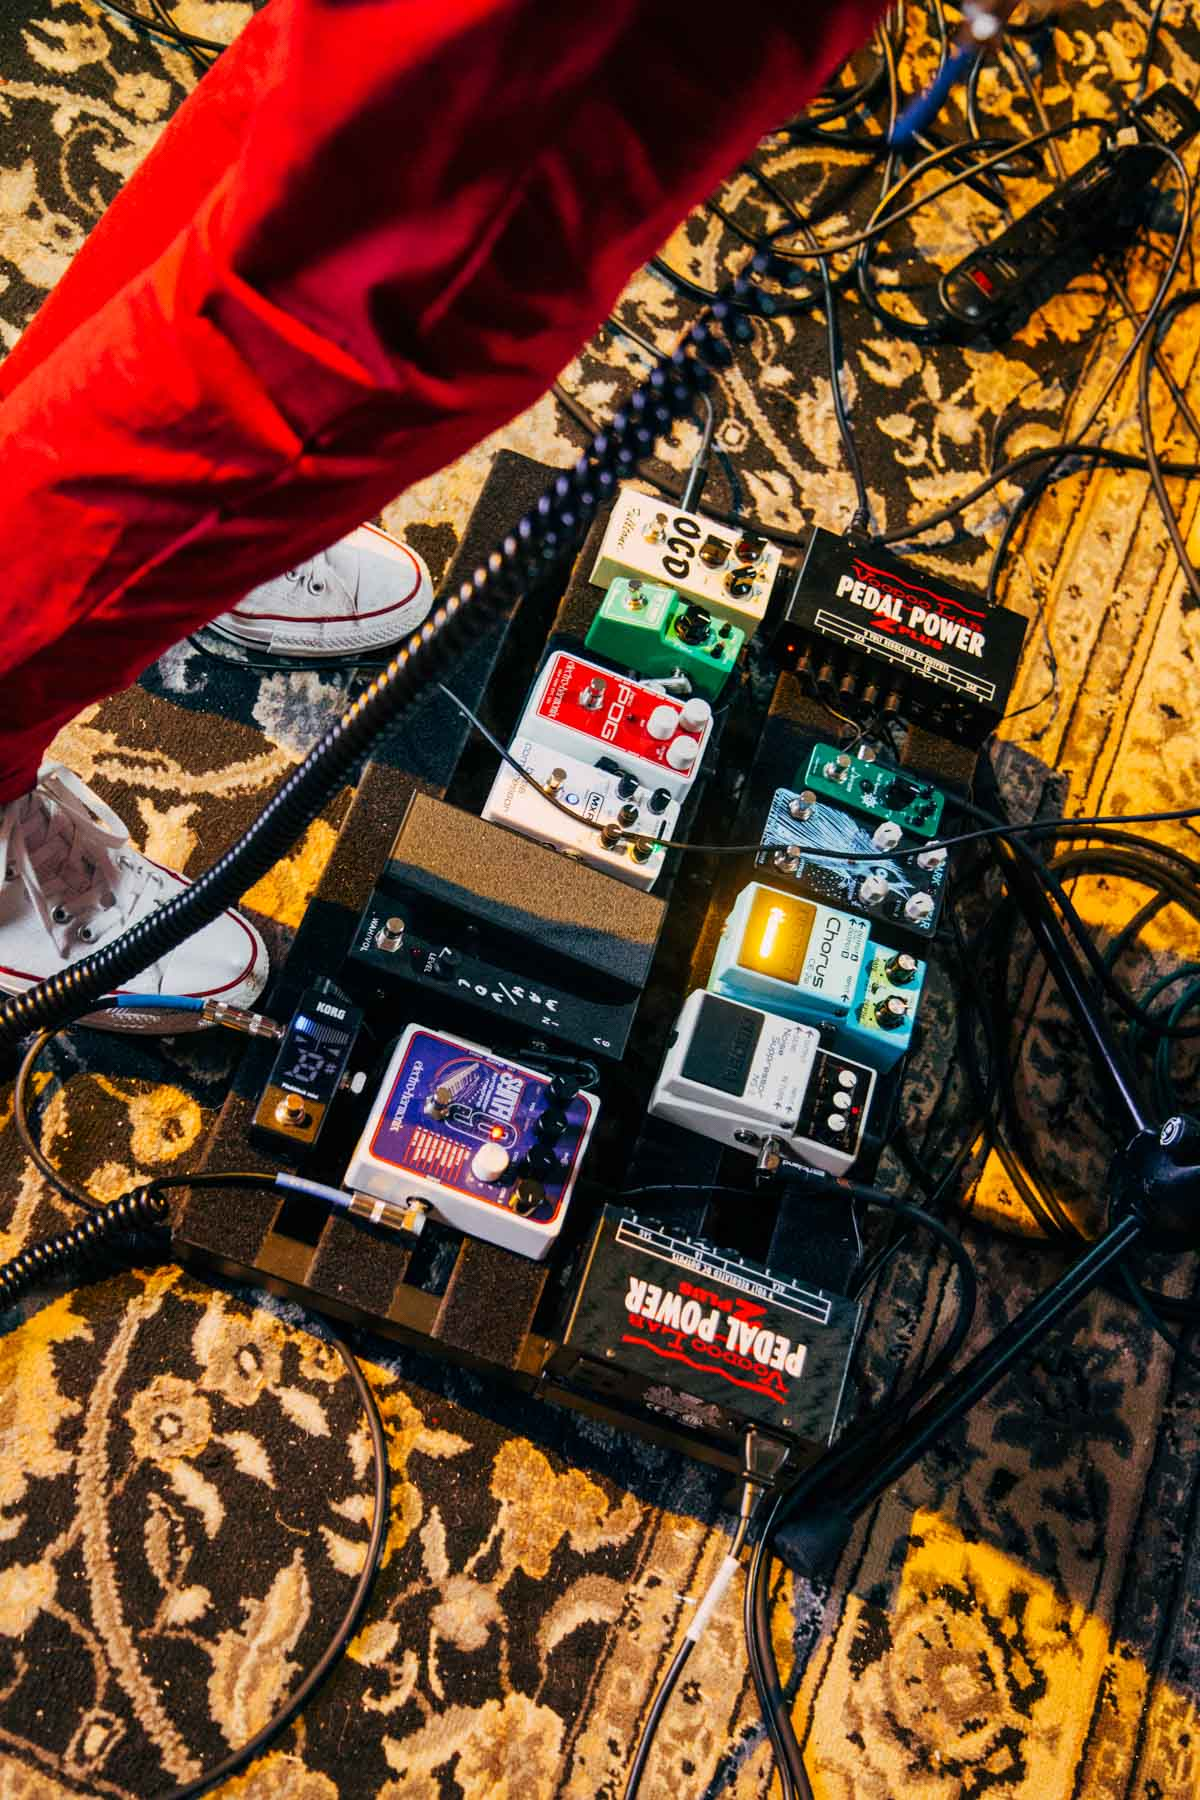 City Mouth on Audiotree Live-28.jpg